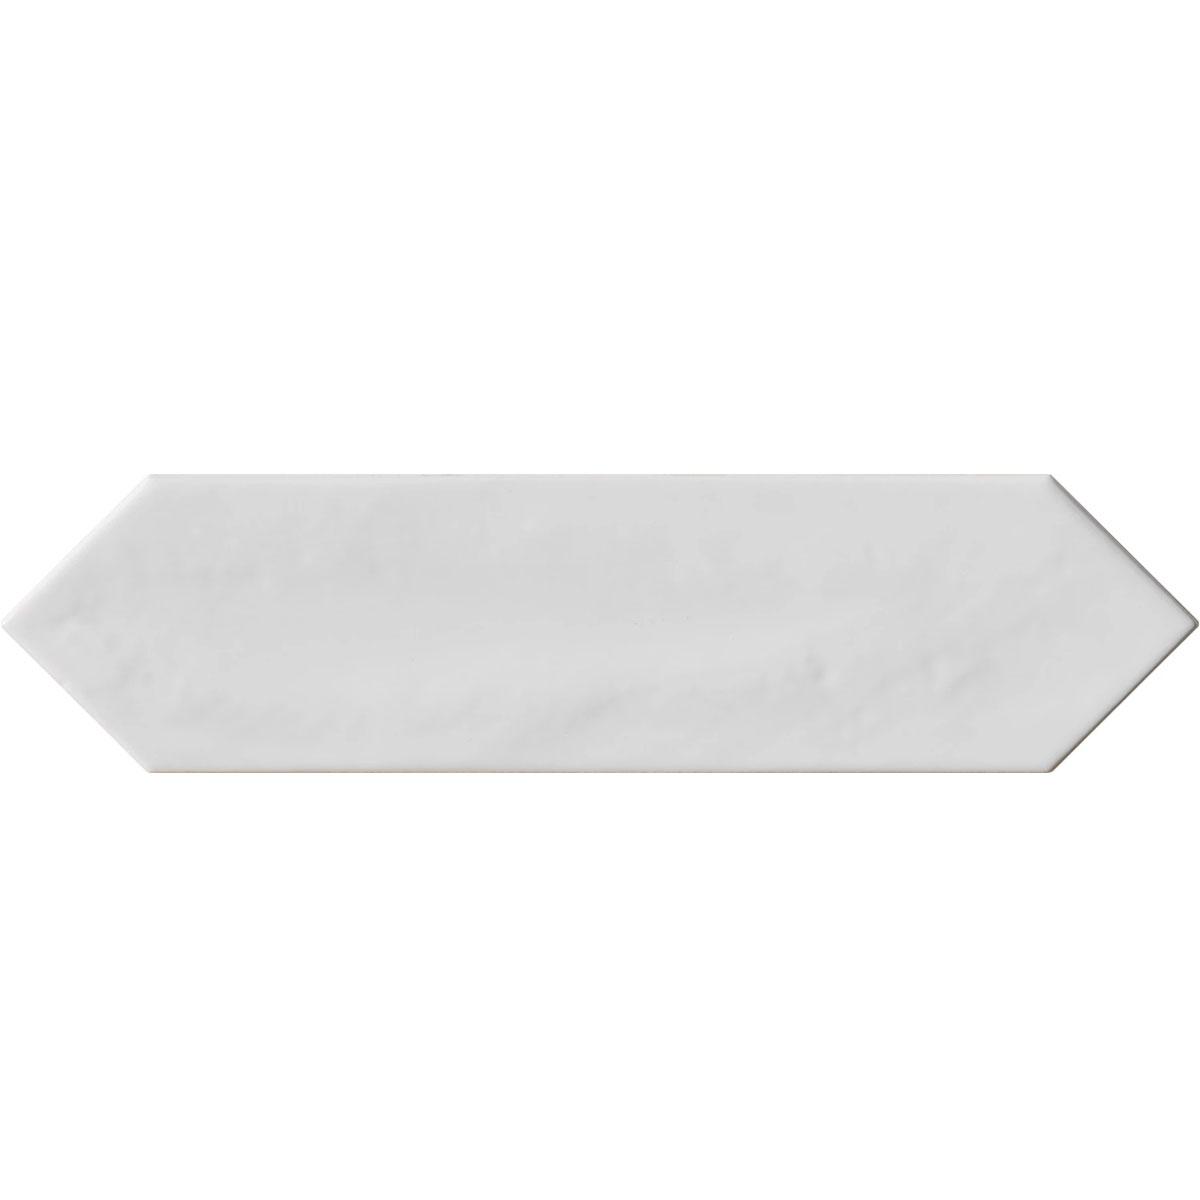 Crayons - White Gloss - Elongated Hexagon Tiles - Stone3 Brisbane